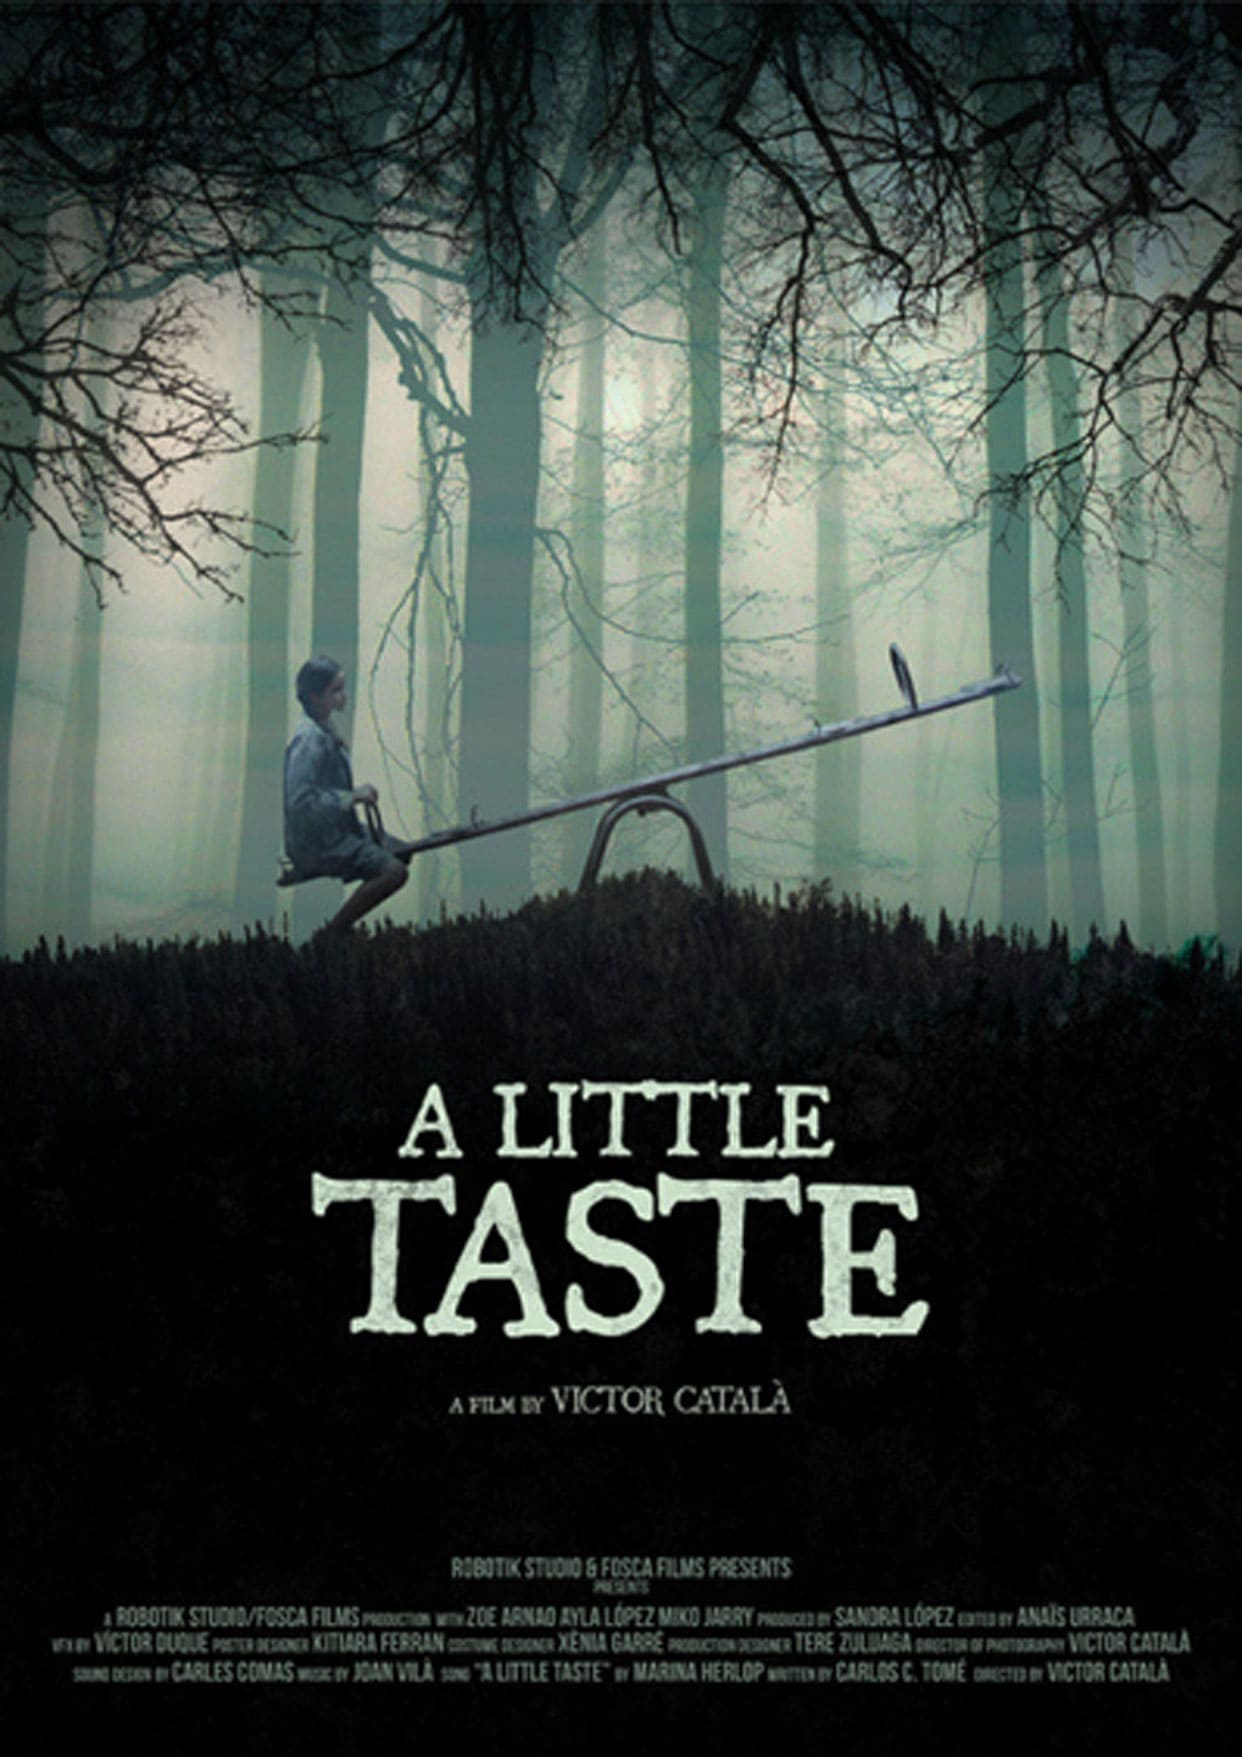 A-LITTLE-TASTE-Víctor-Catala